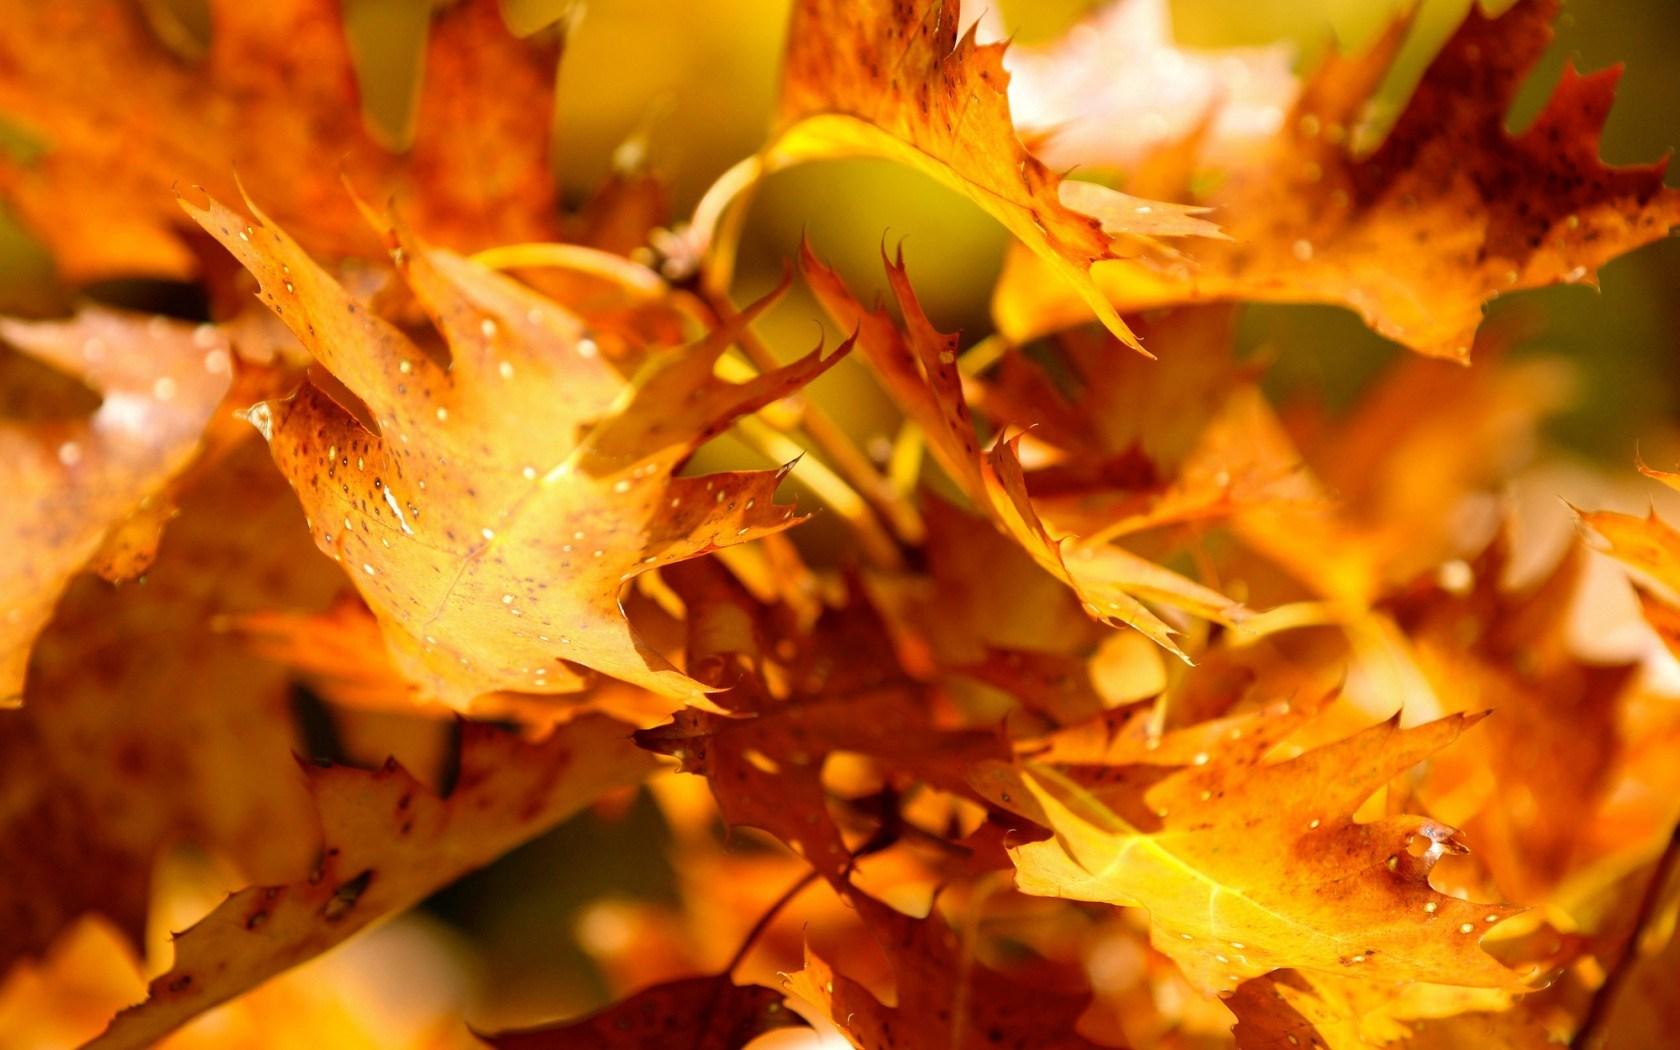 Autumn Leaves 3d Live Wallpaper Autumn Yellow Leaves Hd Desktop Wallpapers 4k Hd